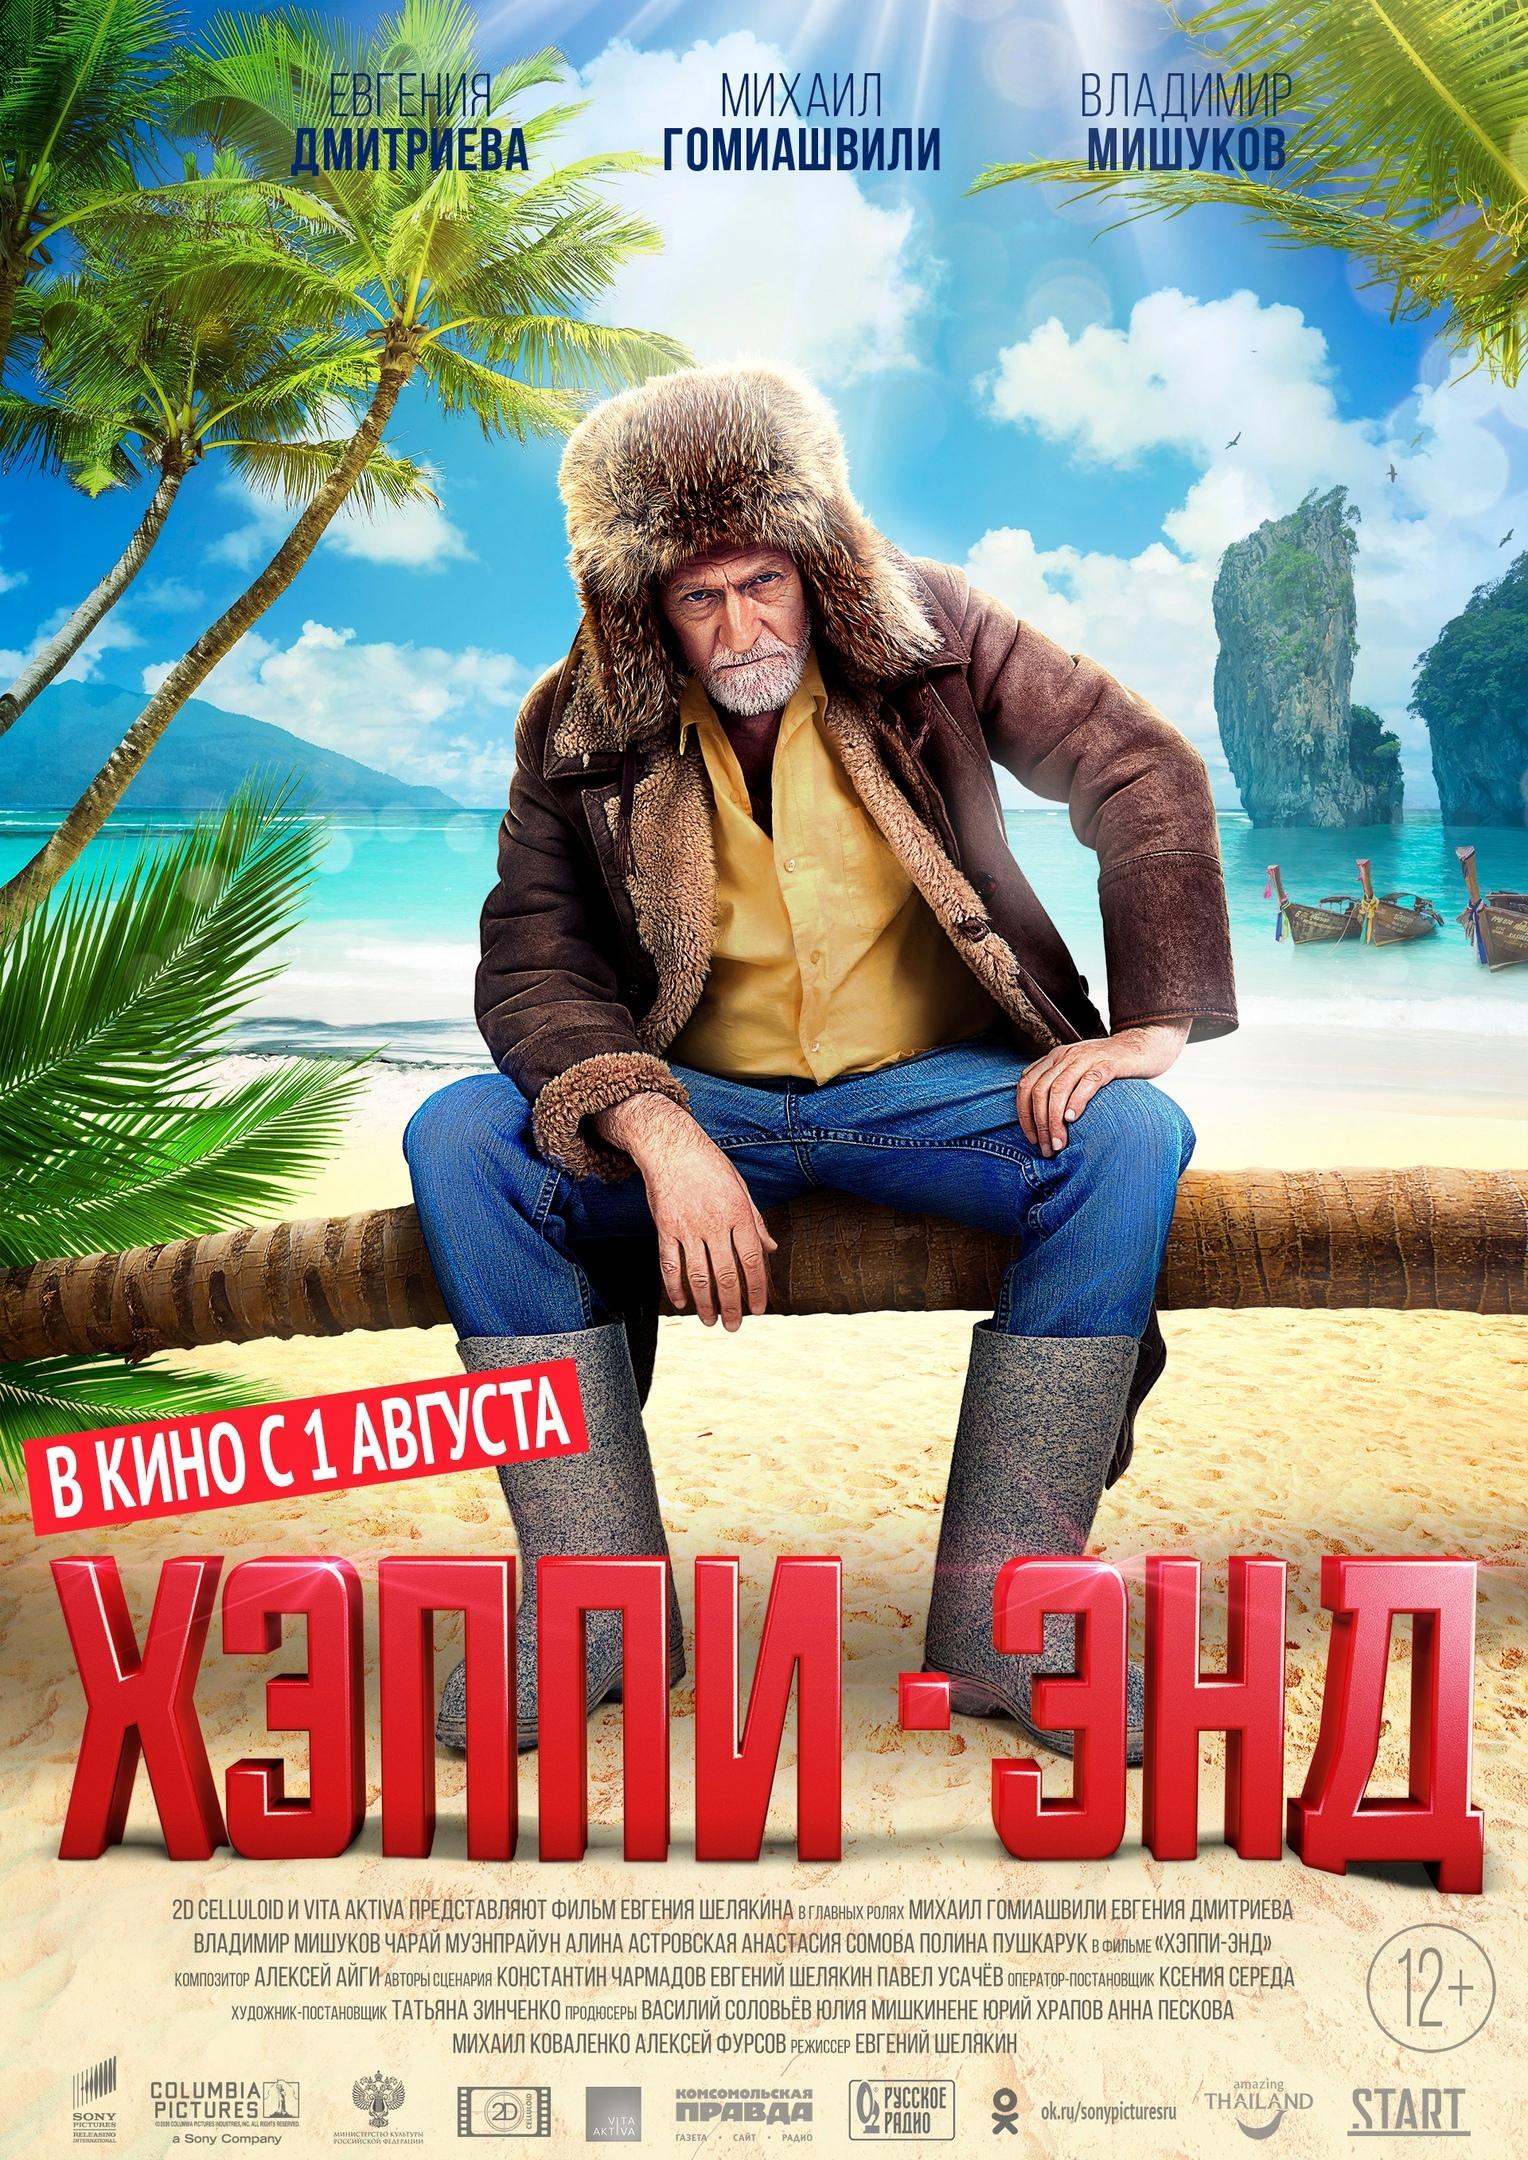 Комедия «Xэппи-энд» (2020) HD